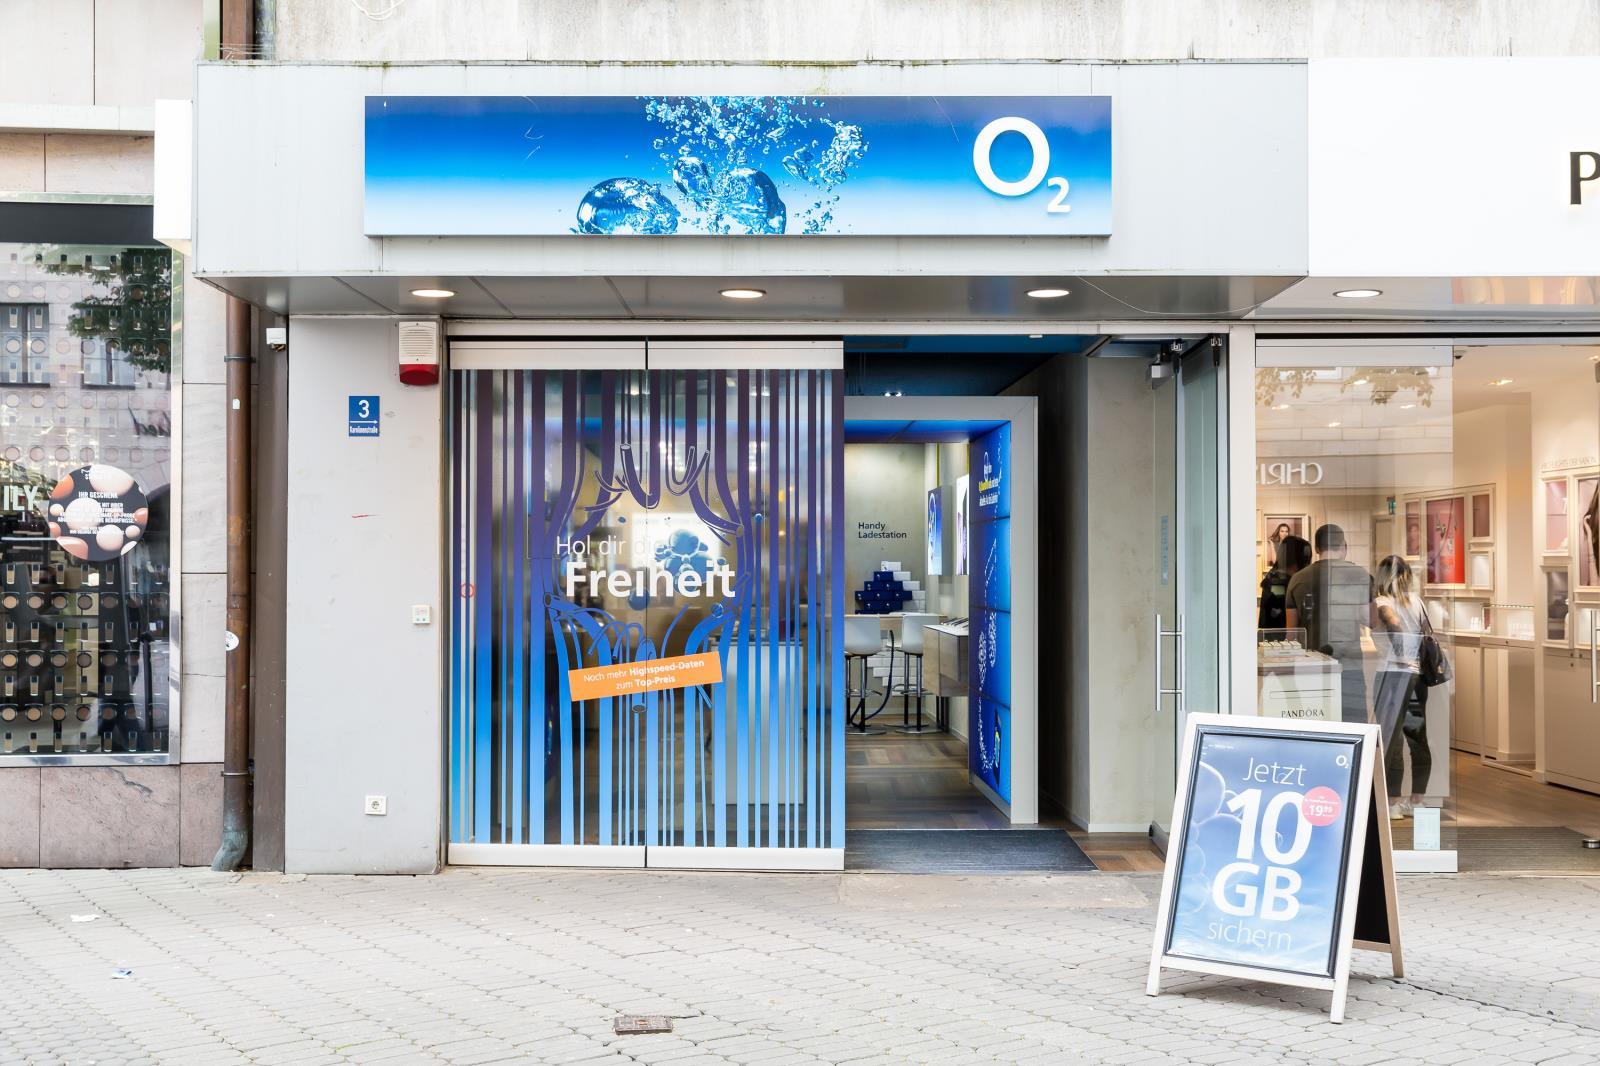 o2 Shop, Karolinenstr. 3 in Nürnberg